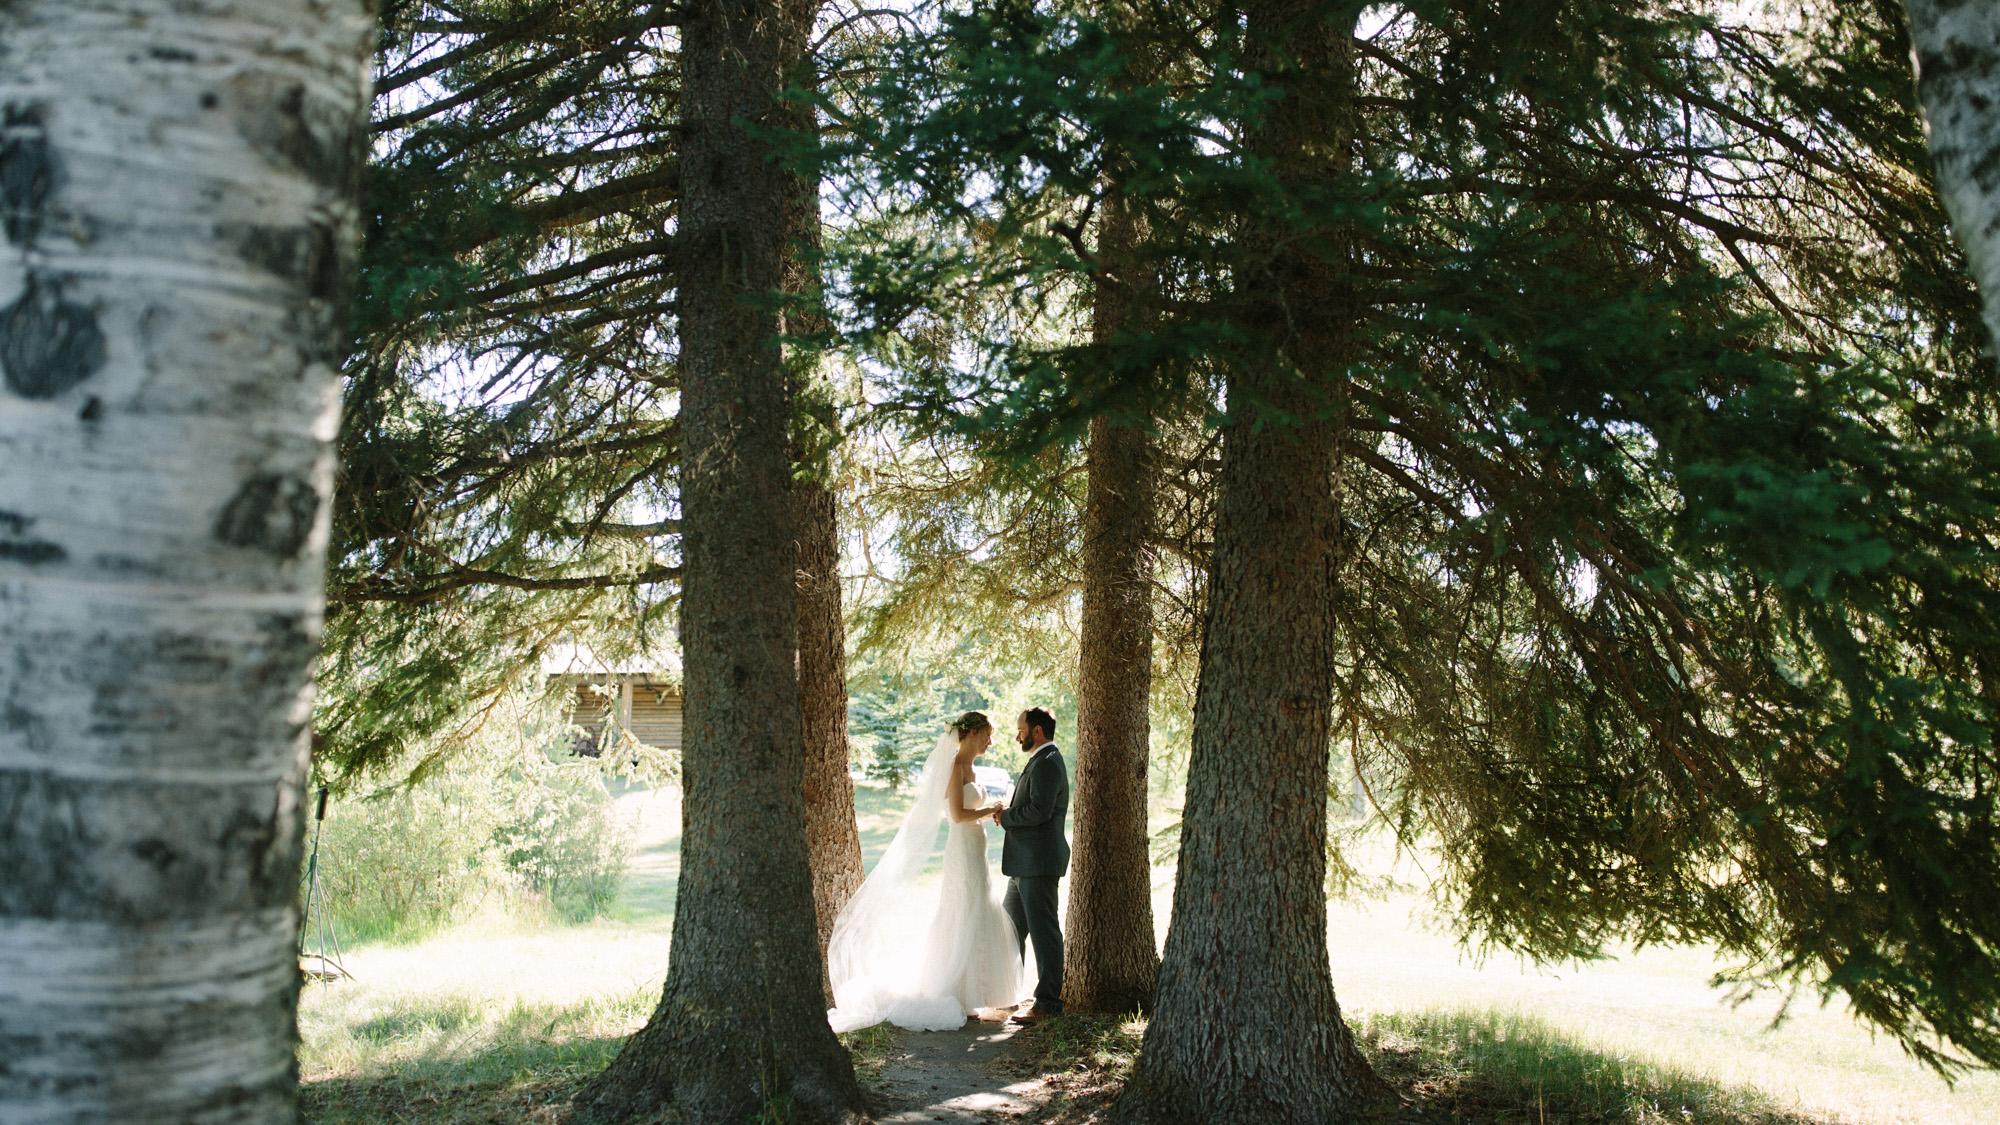 Montana_Wedding_Photos_alec_vanderboom-0111.jpg